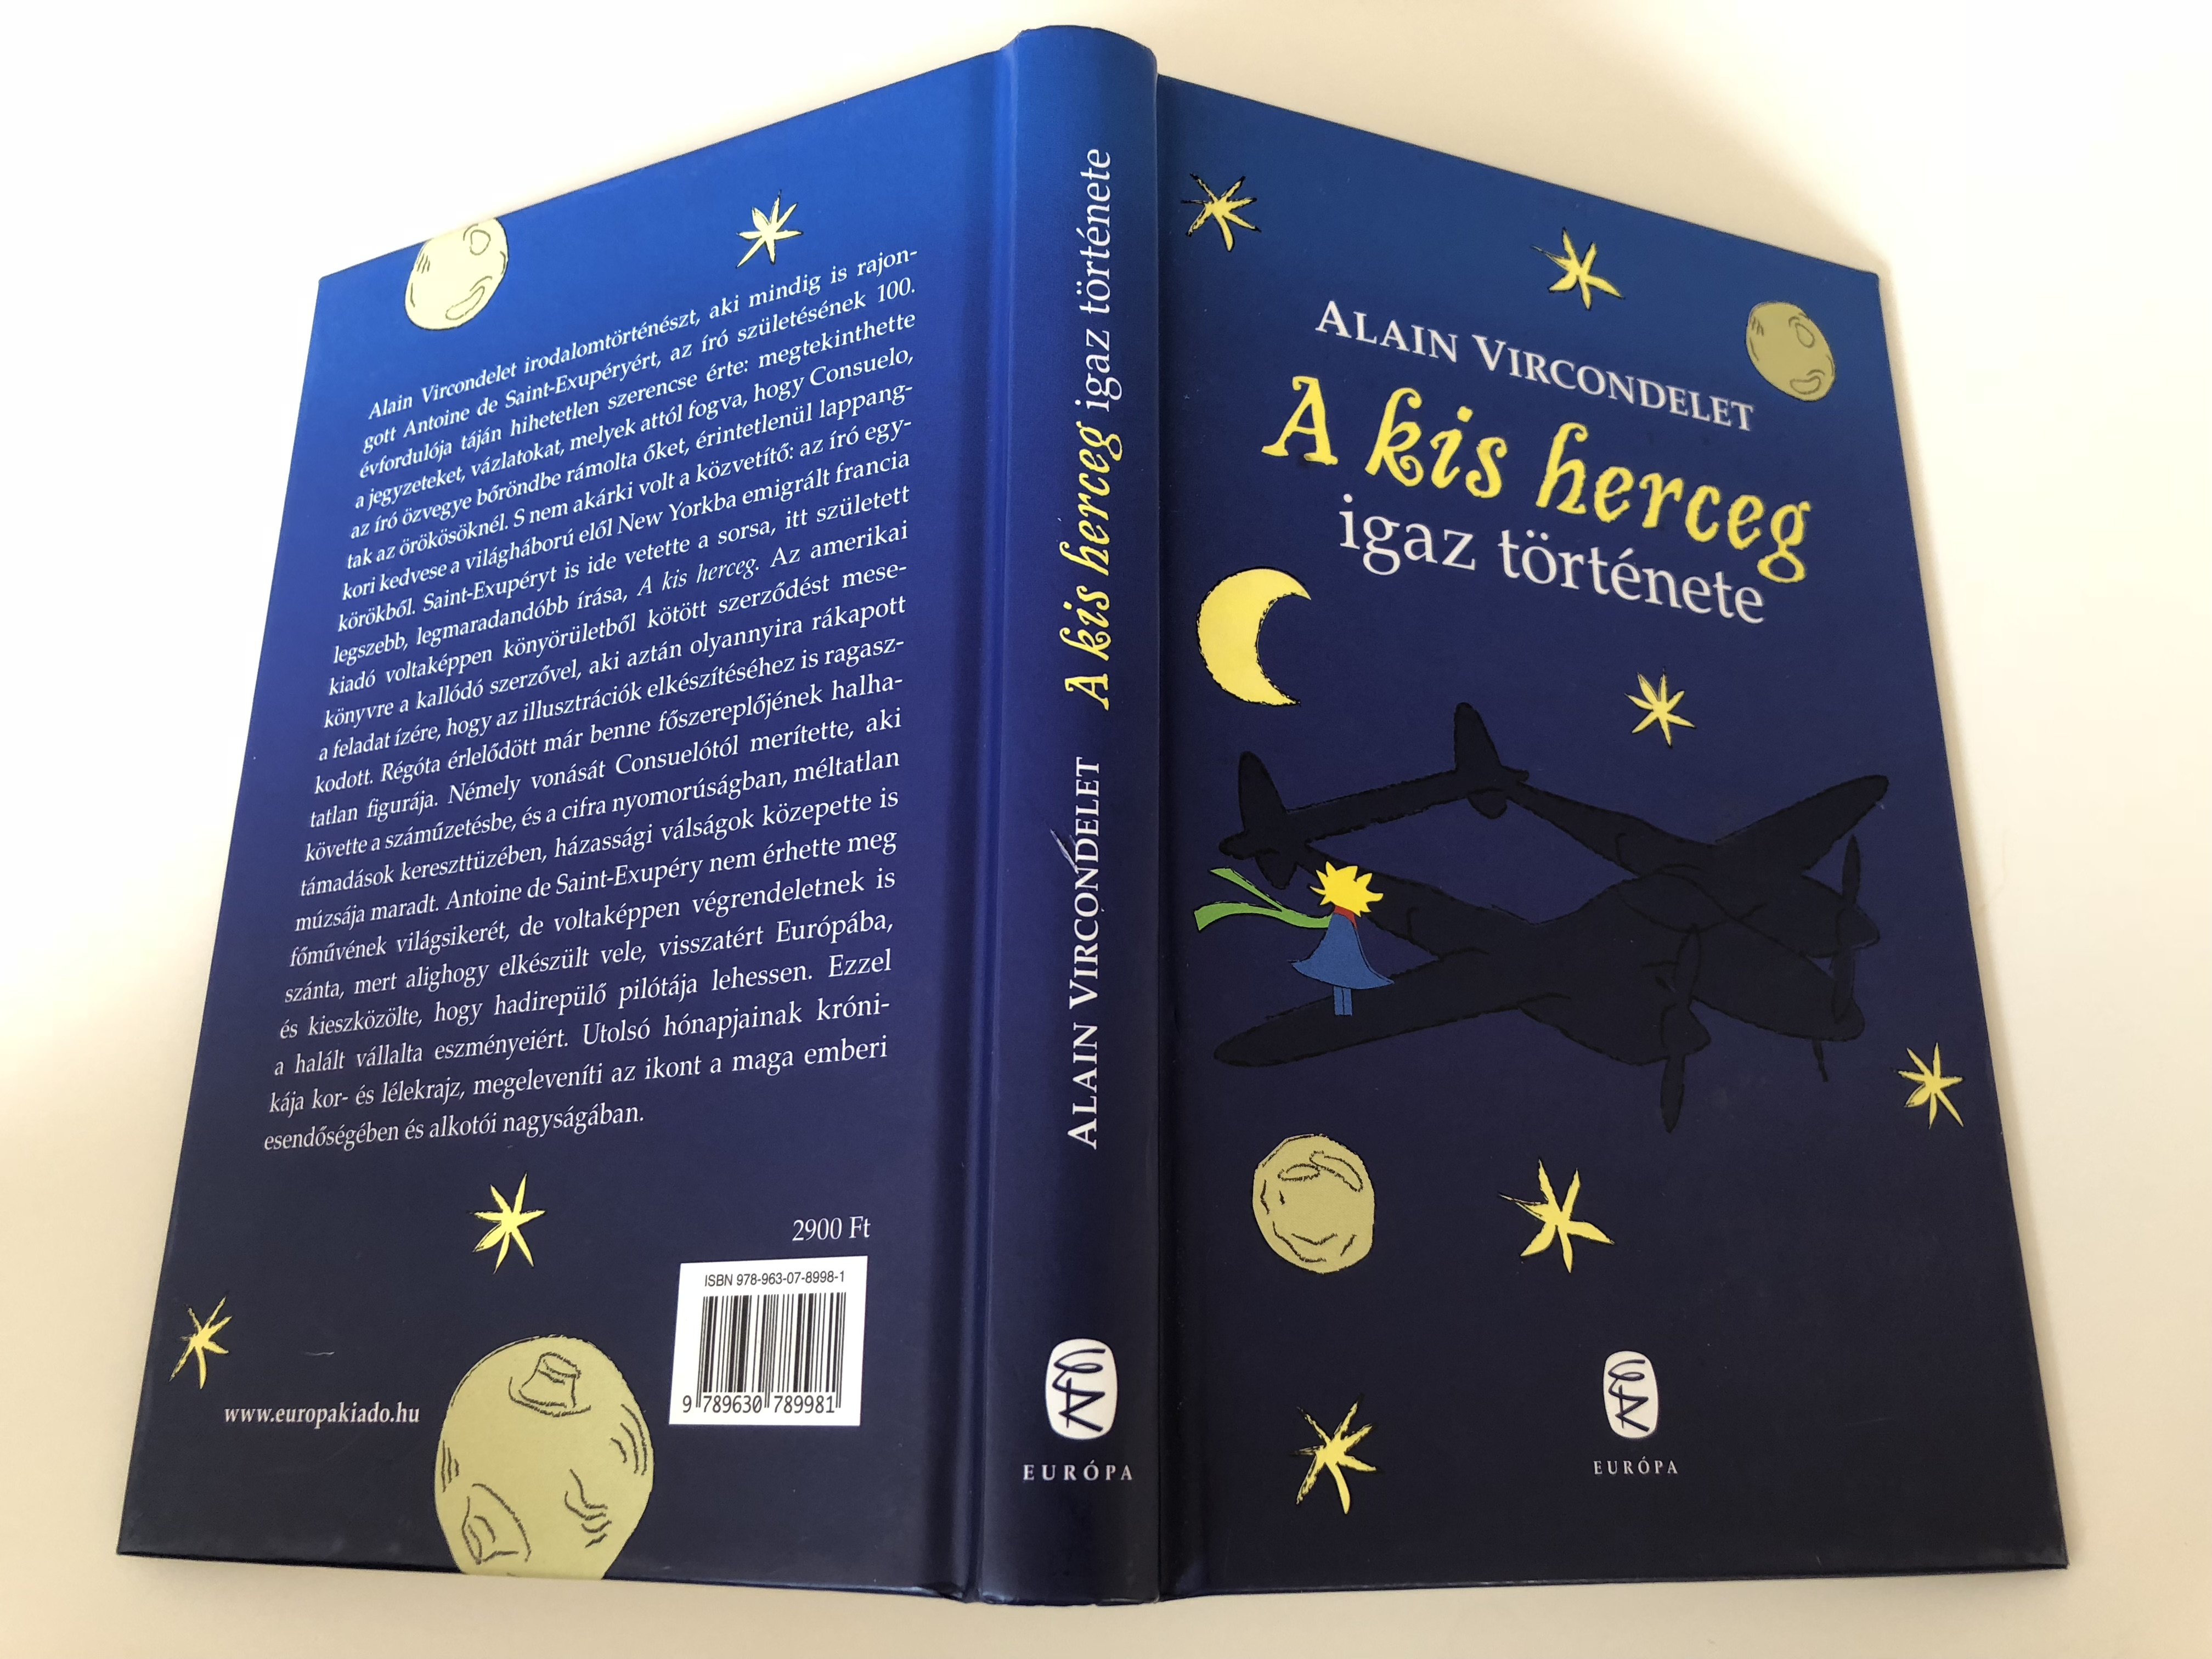 a-kis-herceg-igaz-t-rt-nete-by-alain-vircondelet-hungarian-translation-of-le-v-ritable-historie-du-petit-prince-hardcover-2010-eur-pa-kiad-12-.jpg